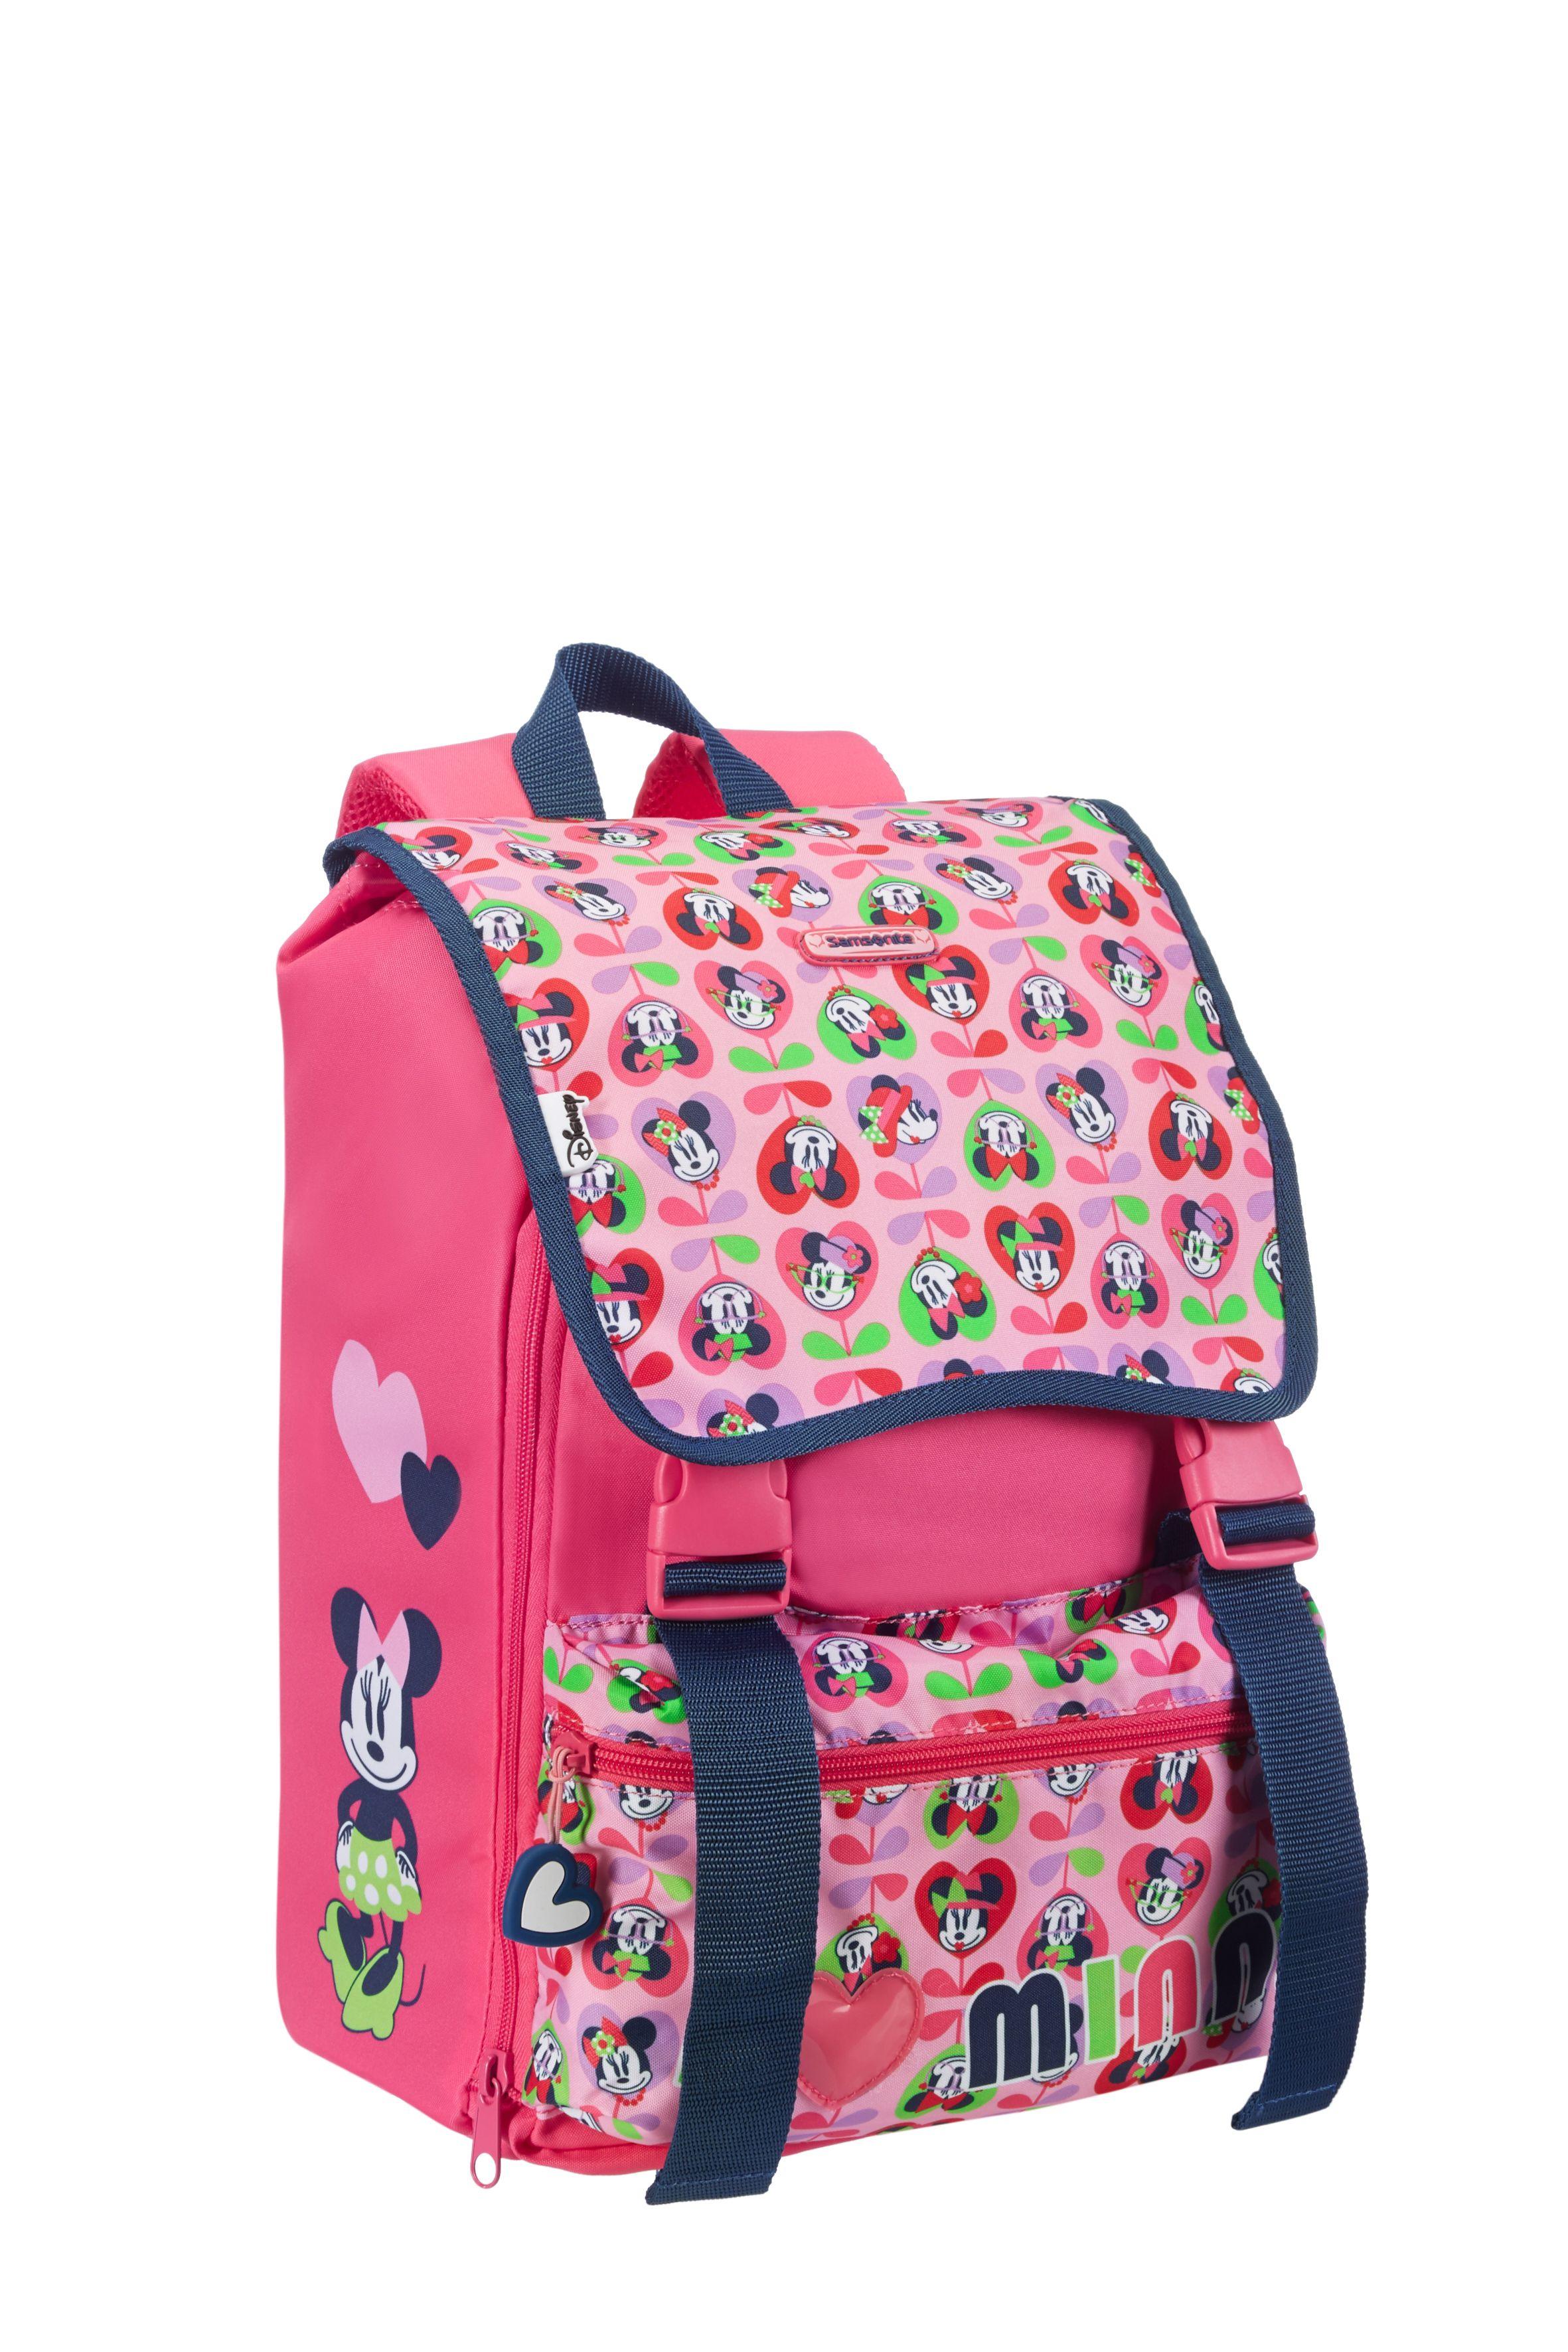 Disney Wonder - Minnie Mouse Ergonomic Backpack #Disney #Samsonite ...